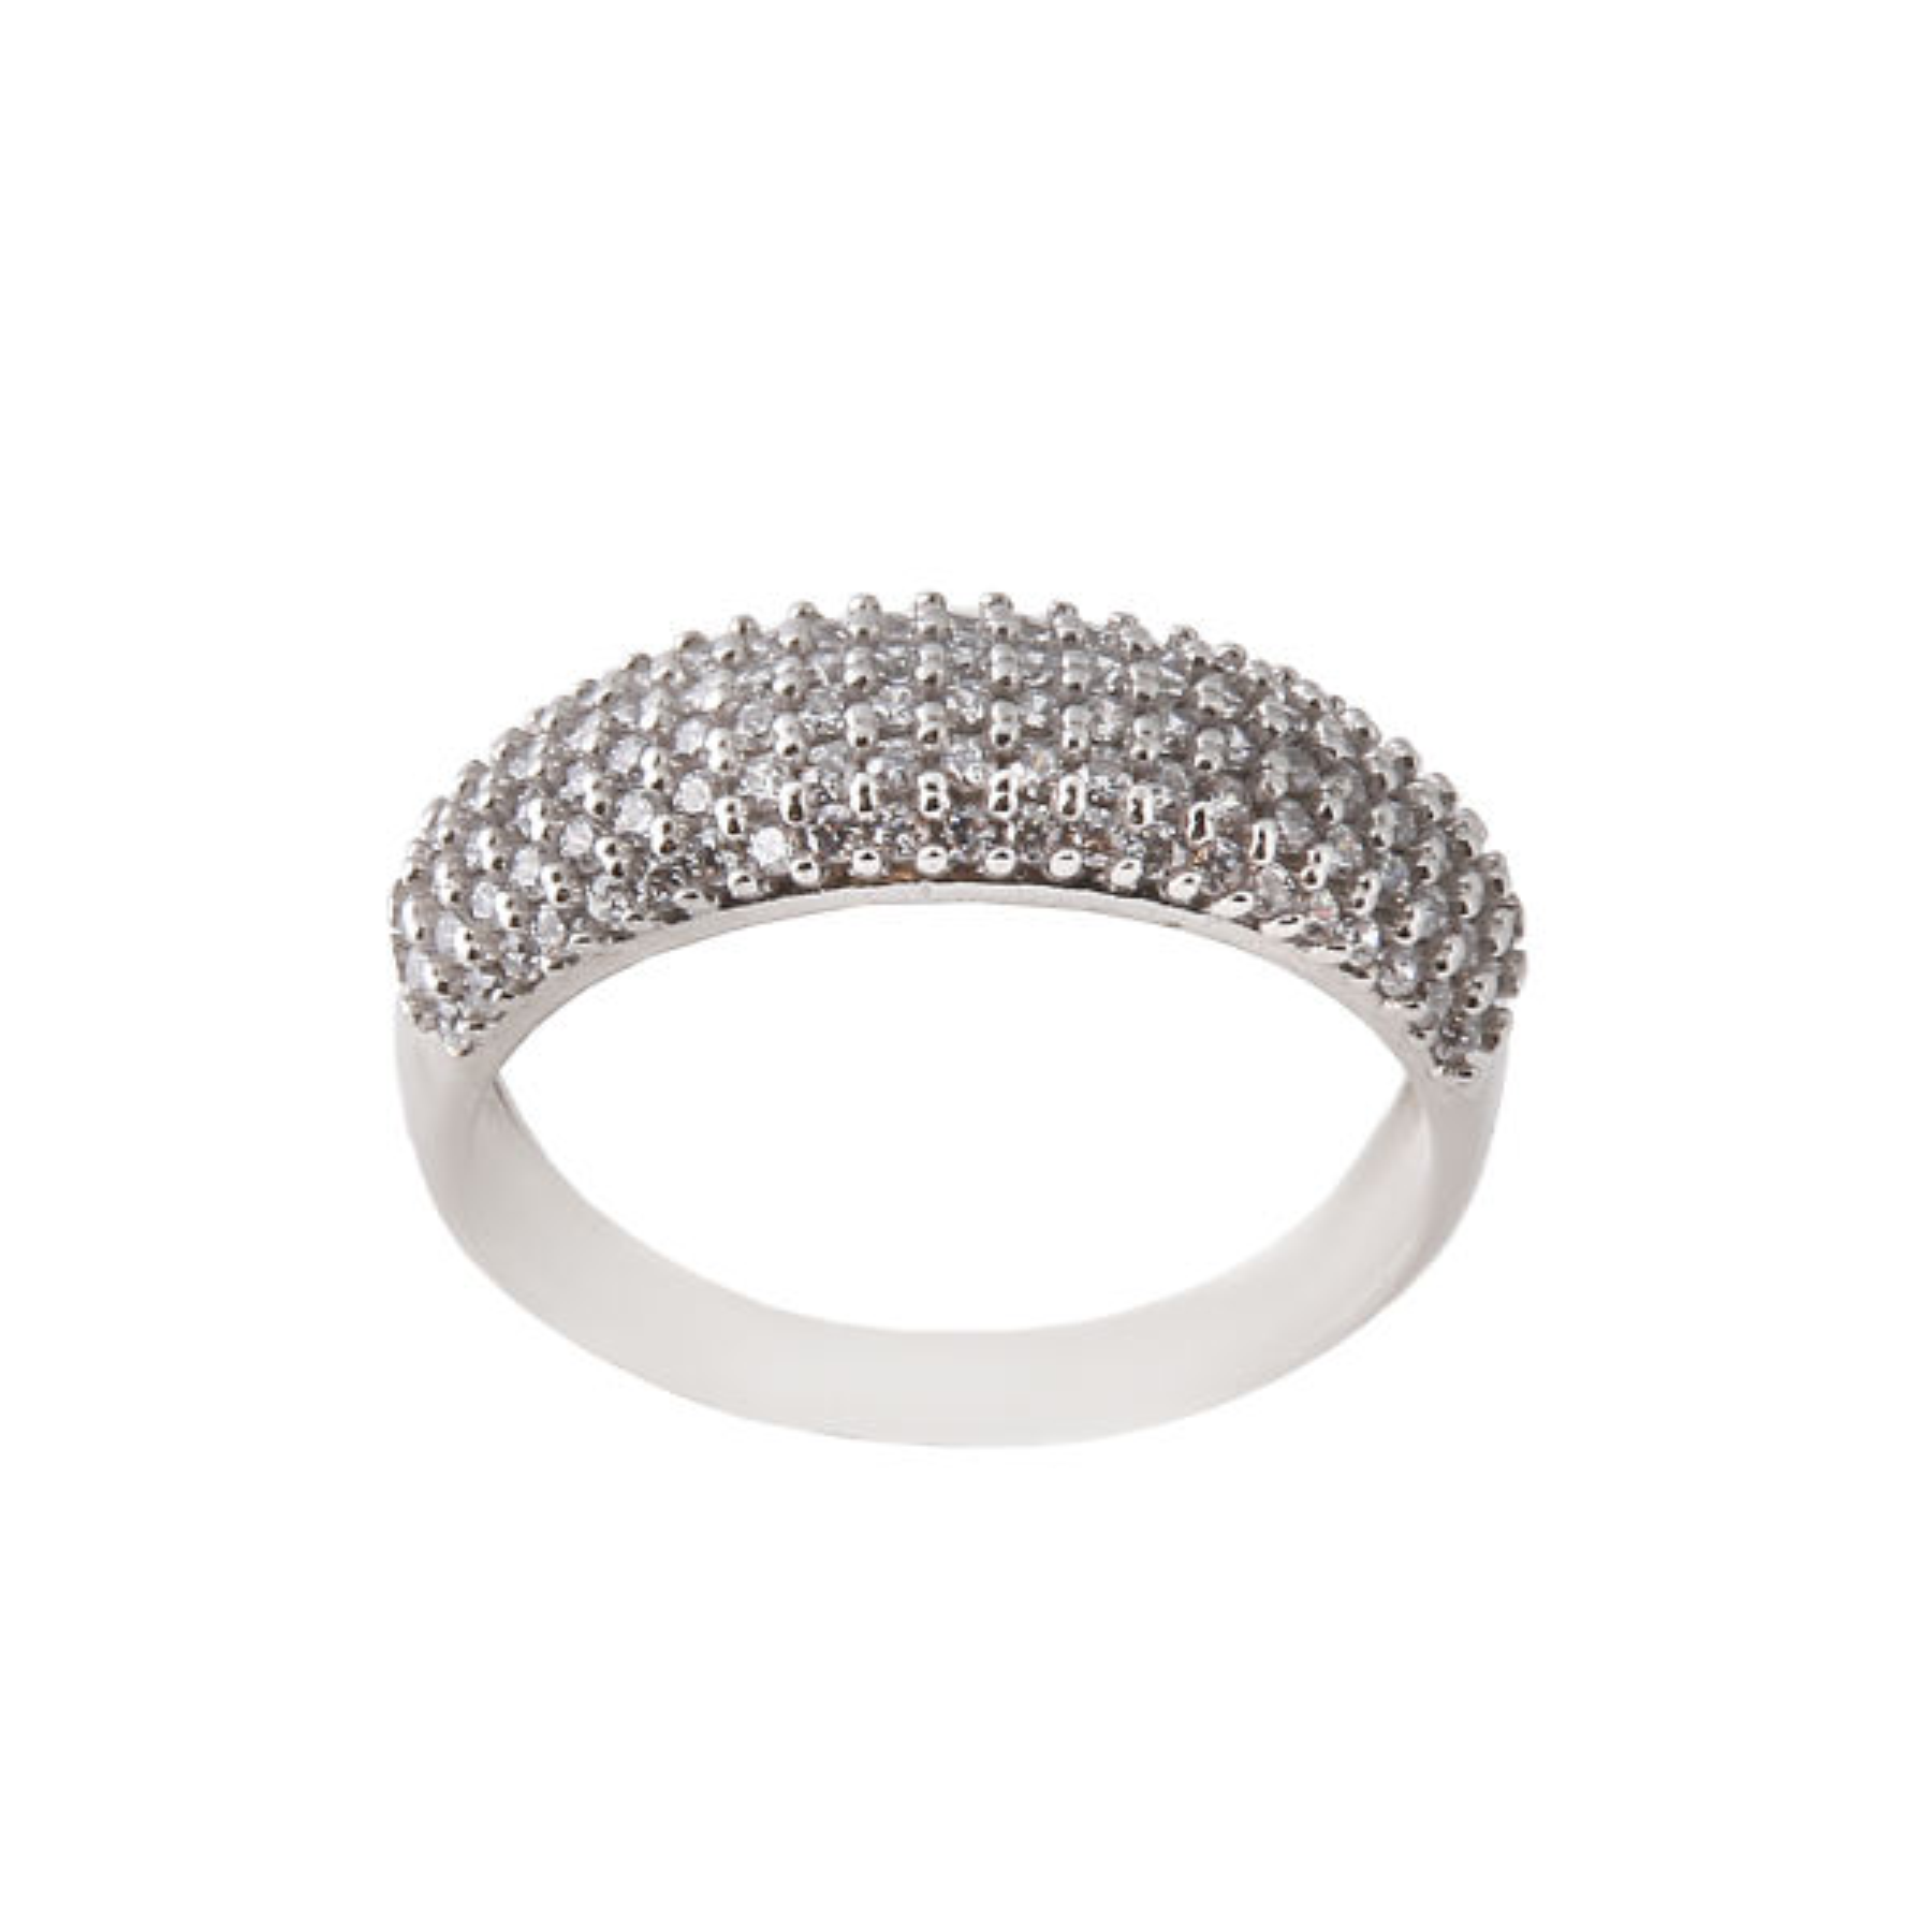 انگشتر نقره زنانه مدل رینگ کد FR0003